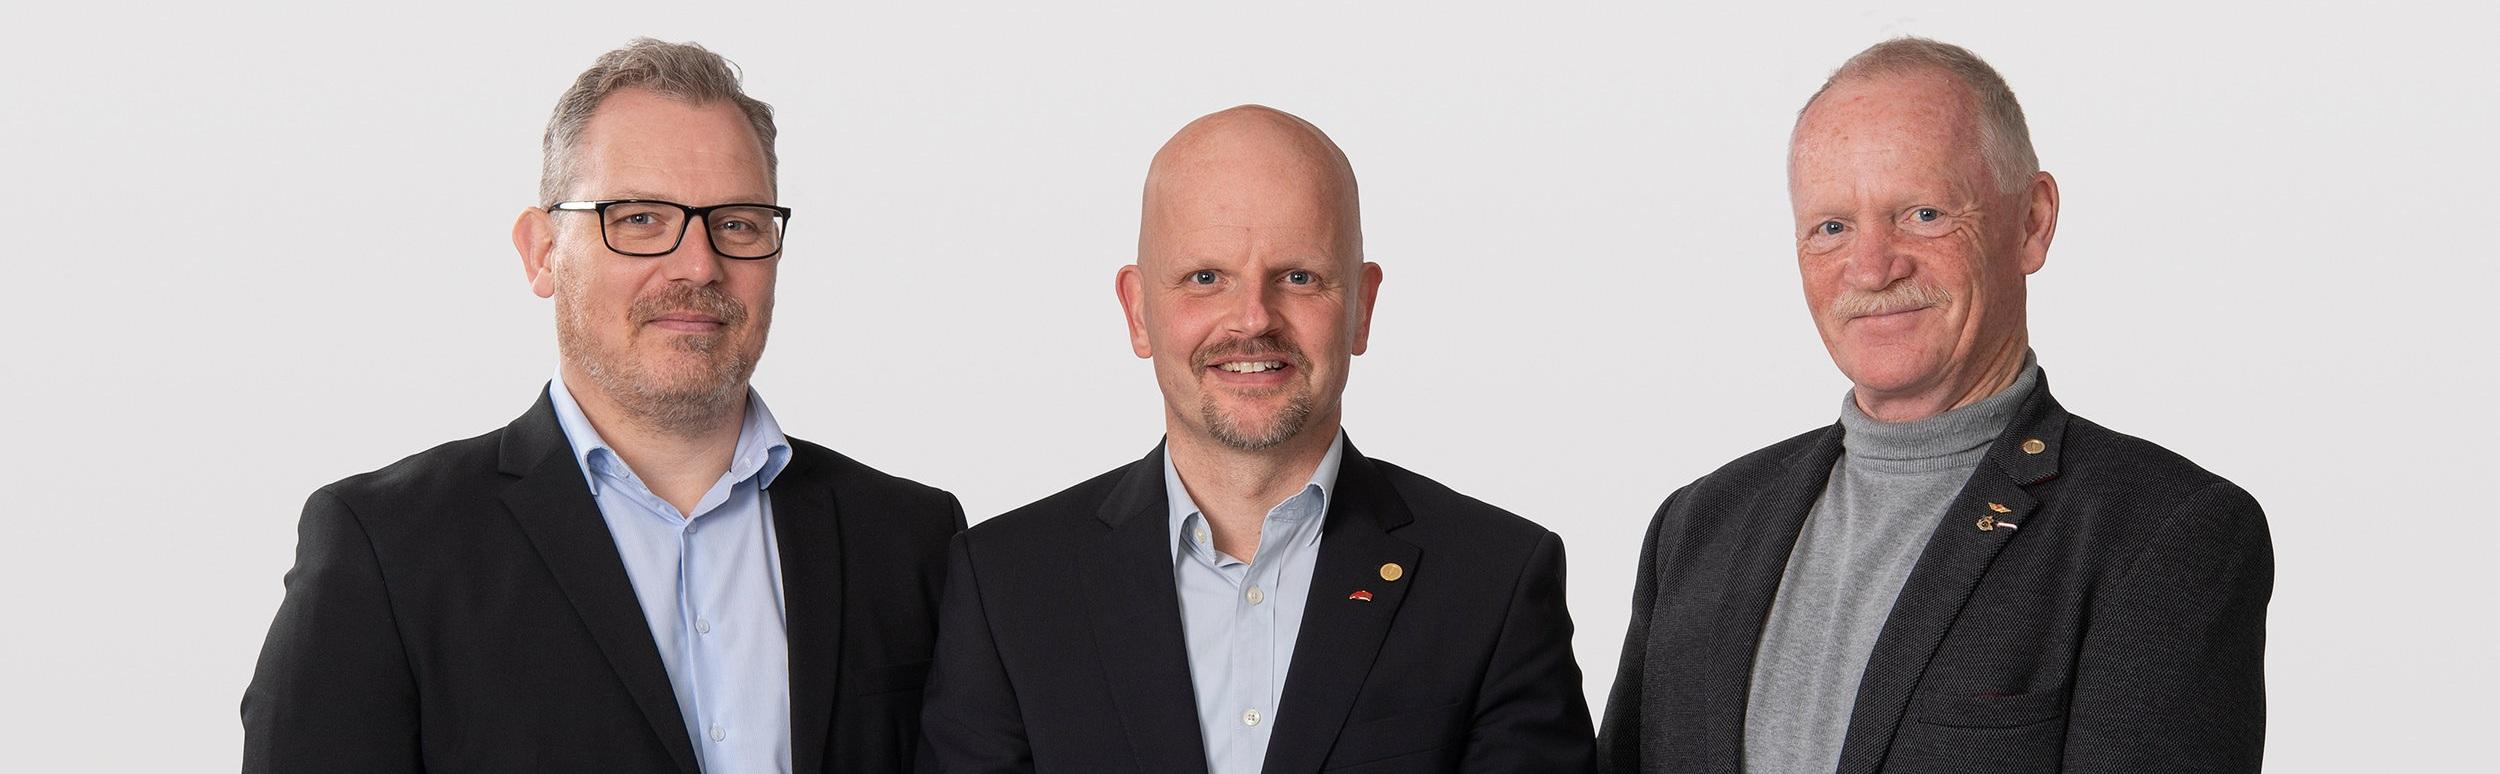 Thomas, Lars og Jens